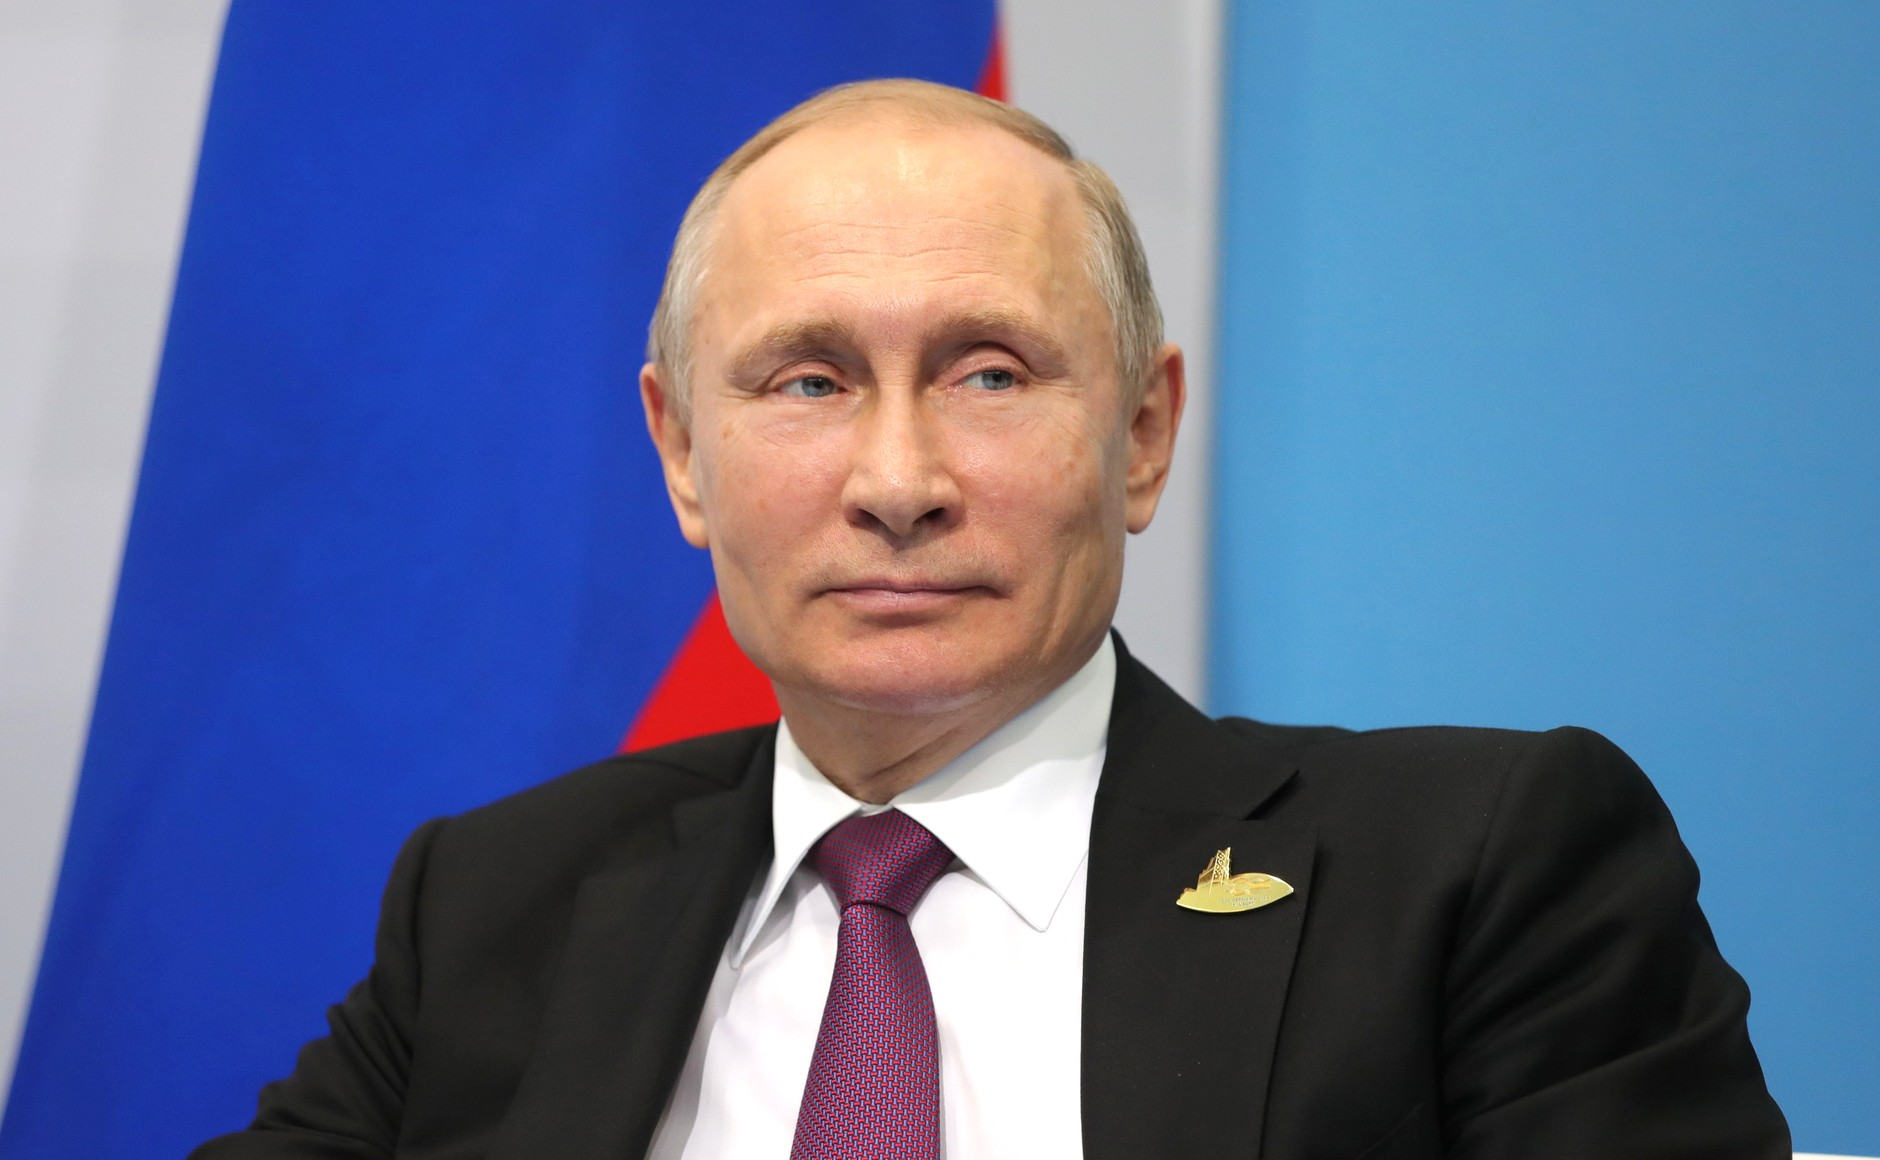 Vladimir_Putin_and_Emmanuel_Macron_(2017-07-08)_03